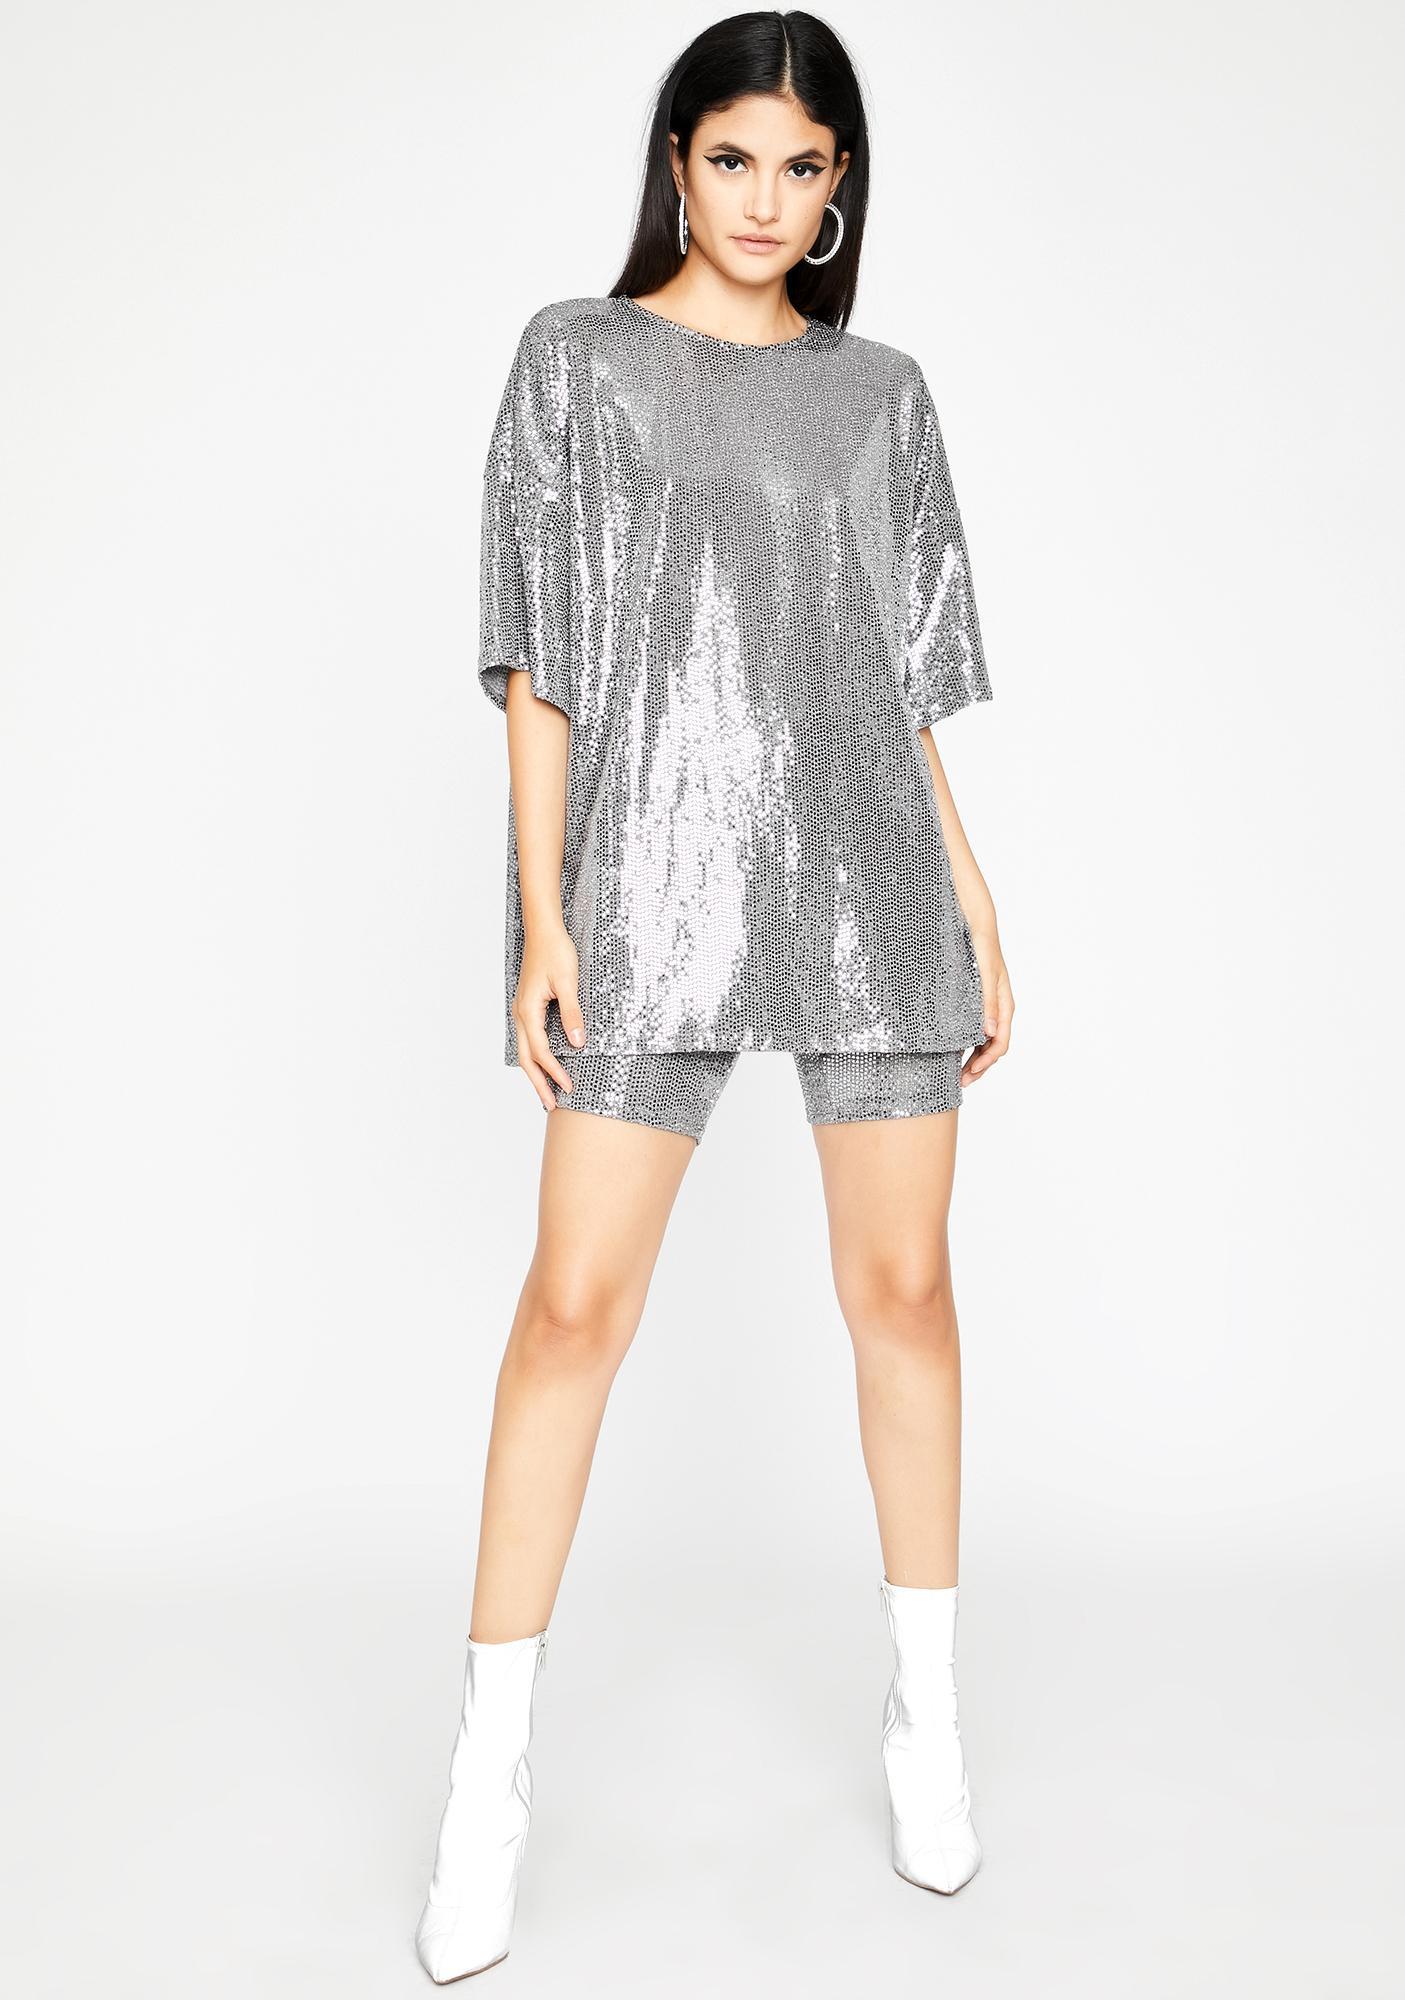 Shiny Stuntin' Sequin Shorts Set